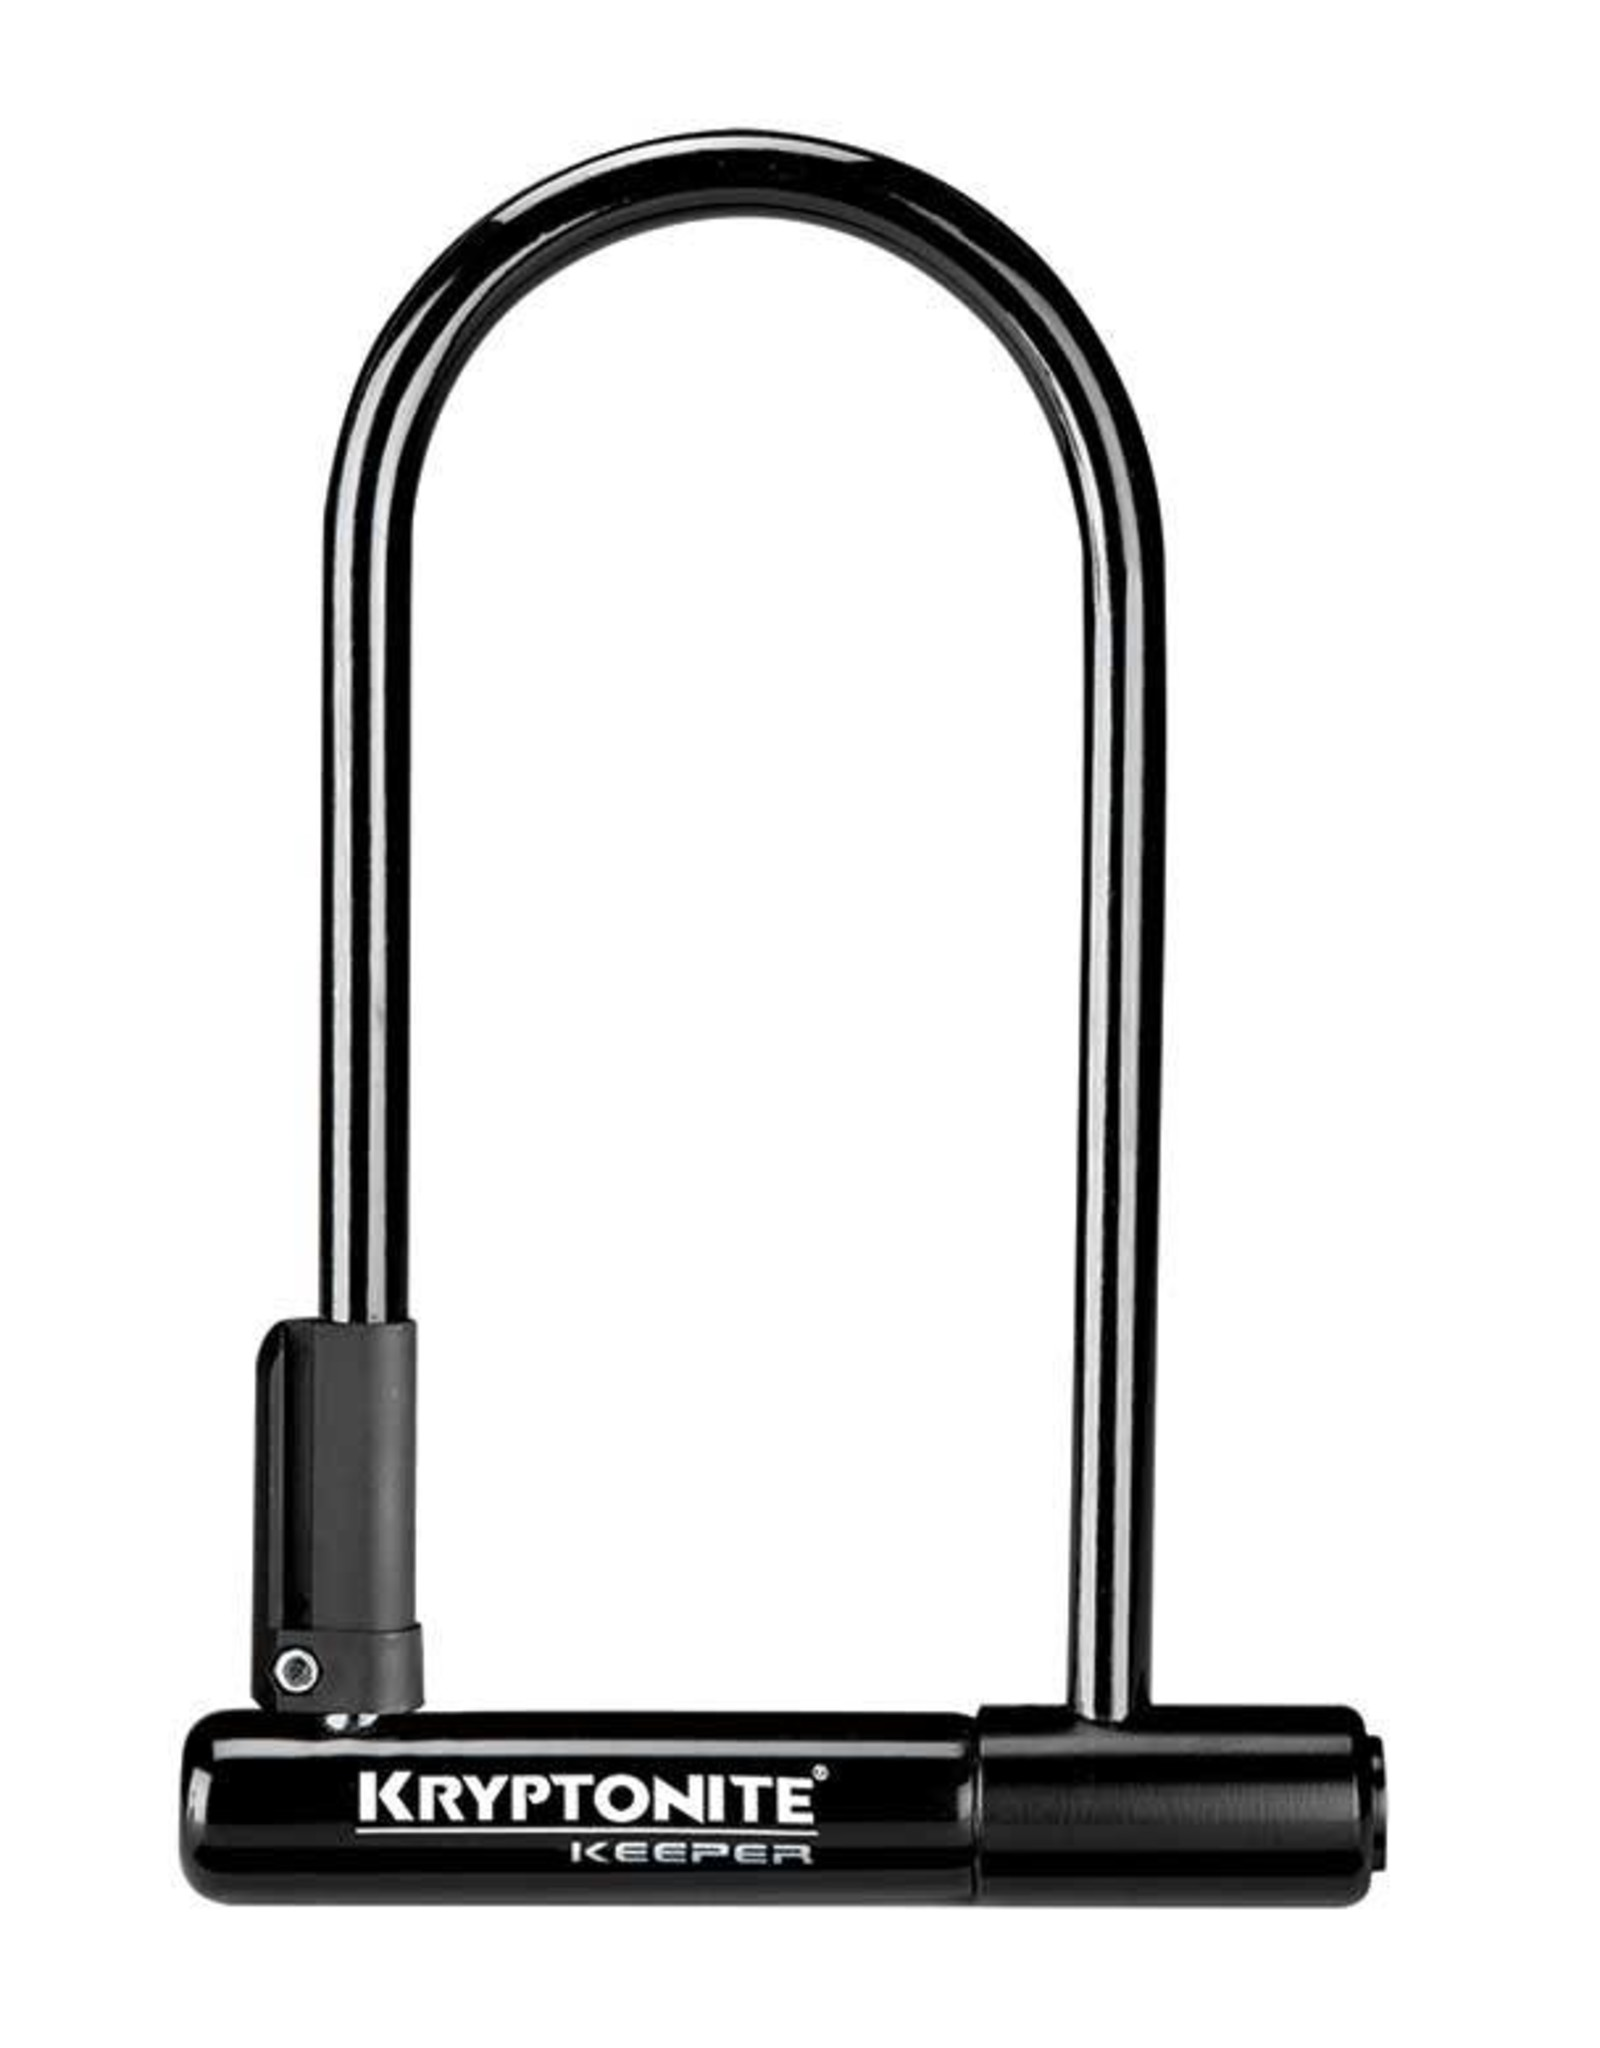 Kryptonite Keeper 12 Standard U-Lock